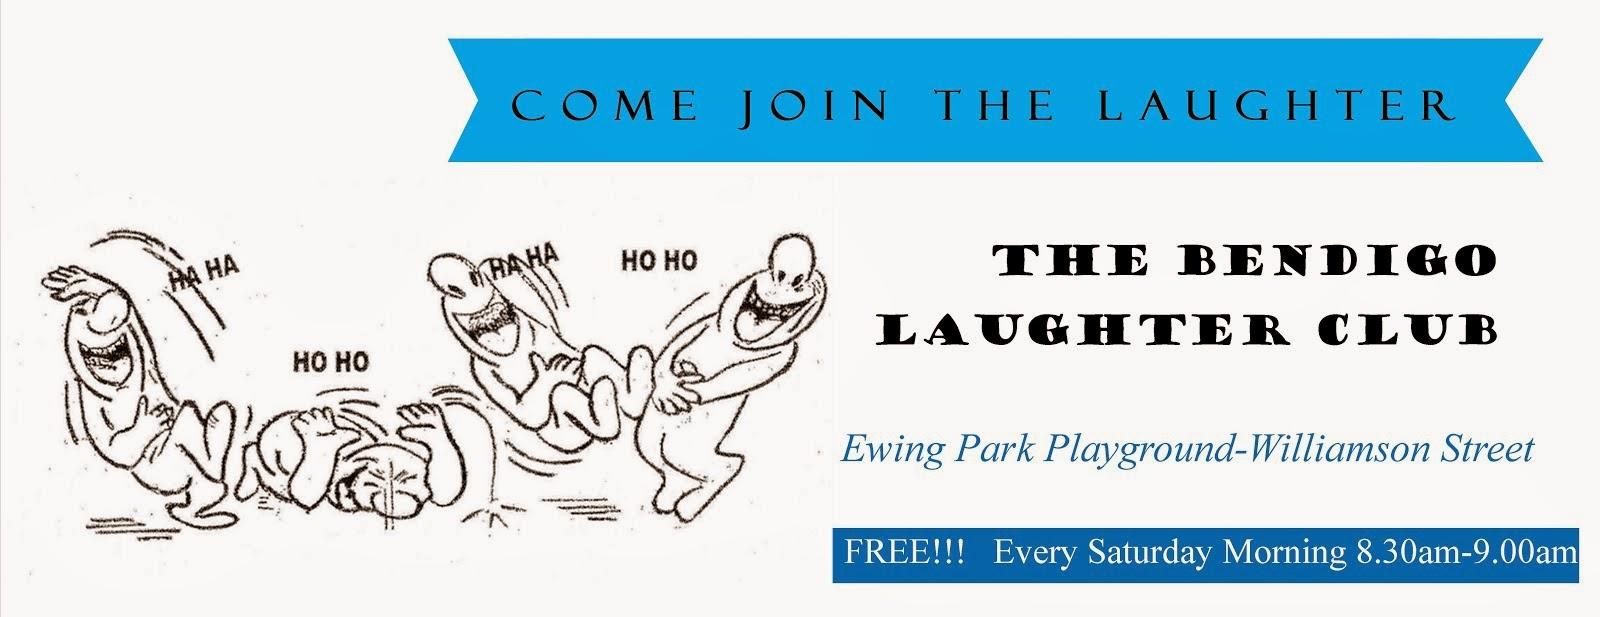 The Bendigo Laughers